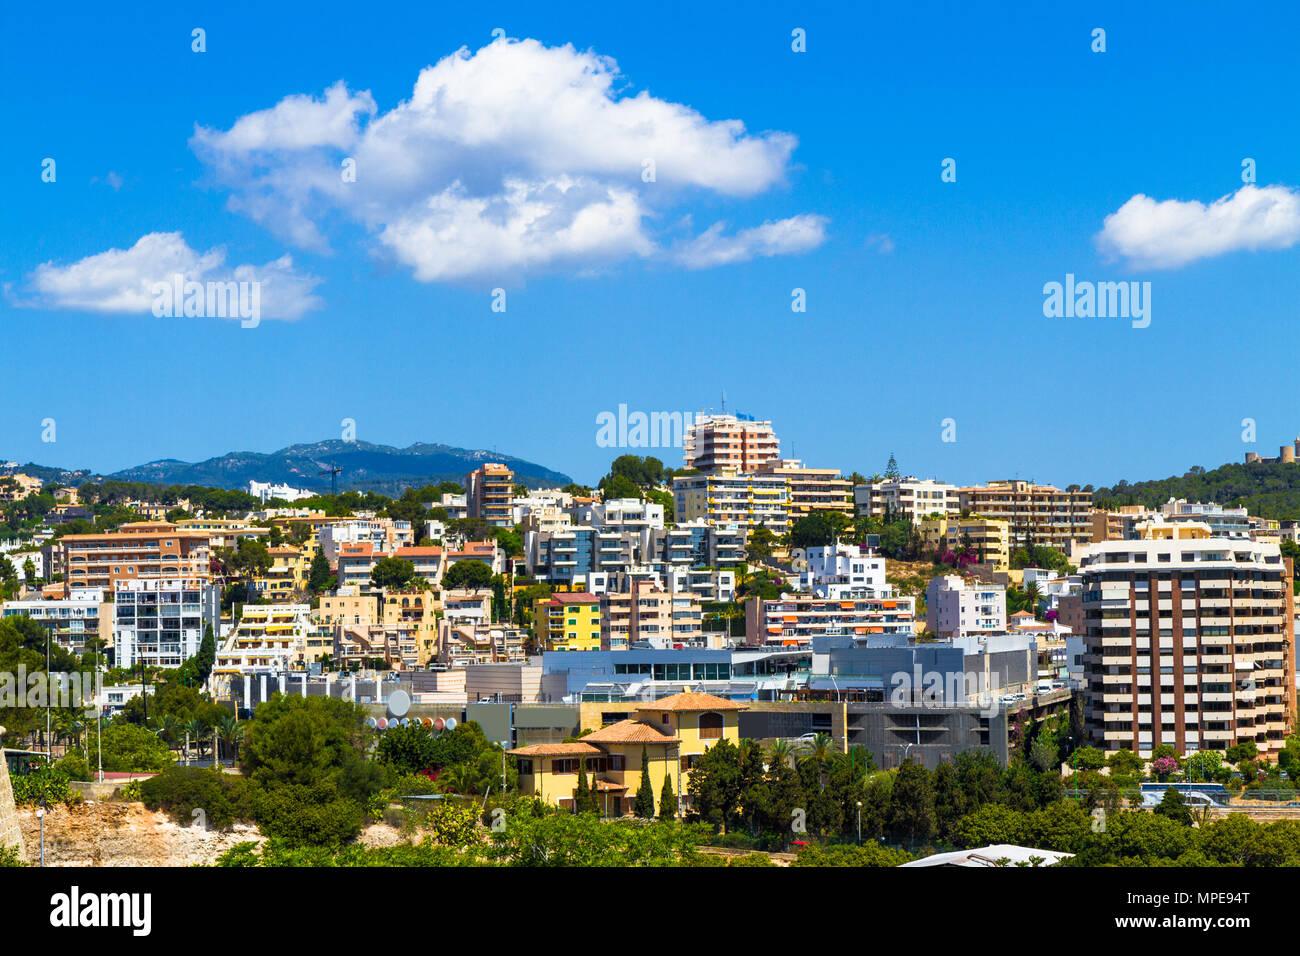 Panoramablick suburban Palma Mallorca im Sommer sonnigen Tag morgen. Stockbild